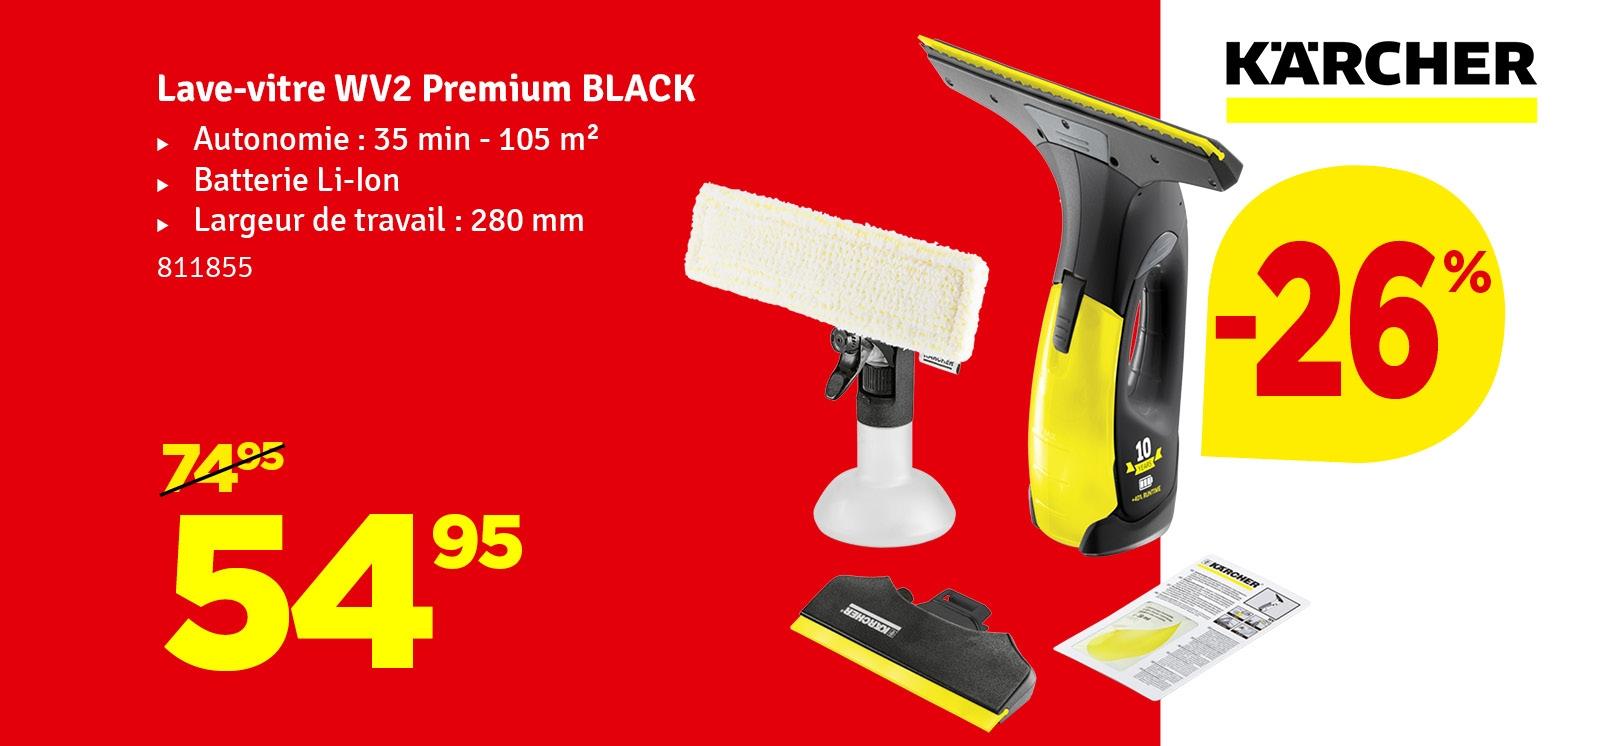 Promo - Nettoyant de vitre WV 2 Premium Black KÄRCHER